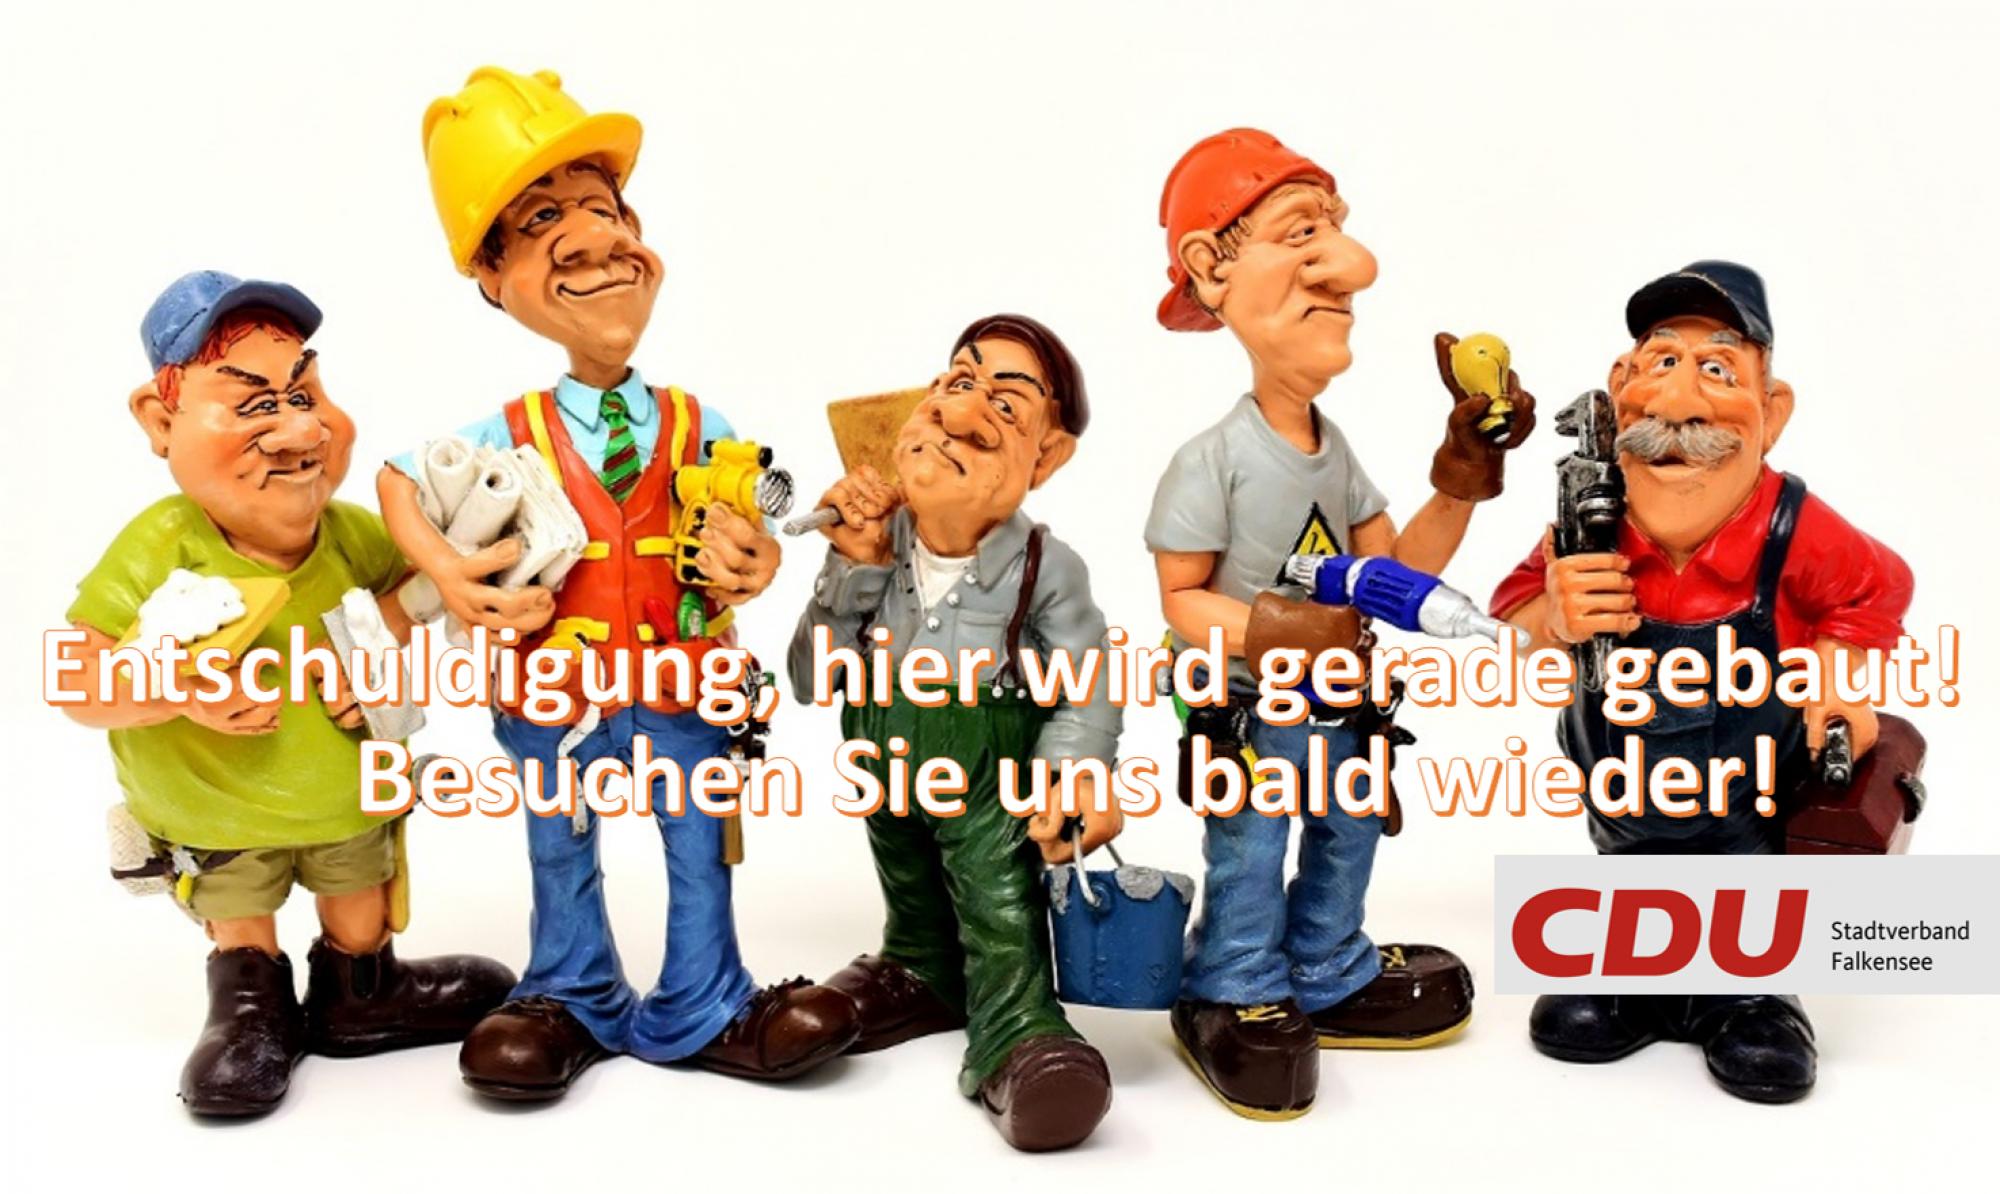 CDU Falkensee